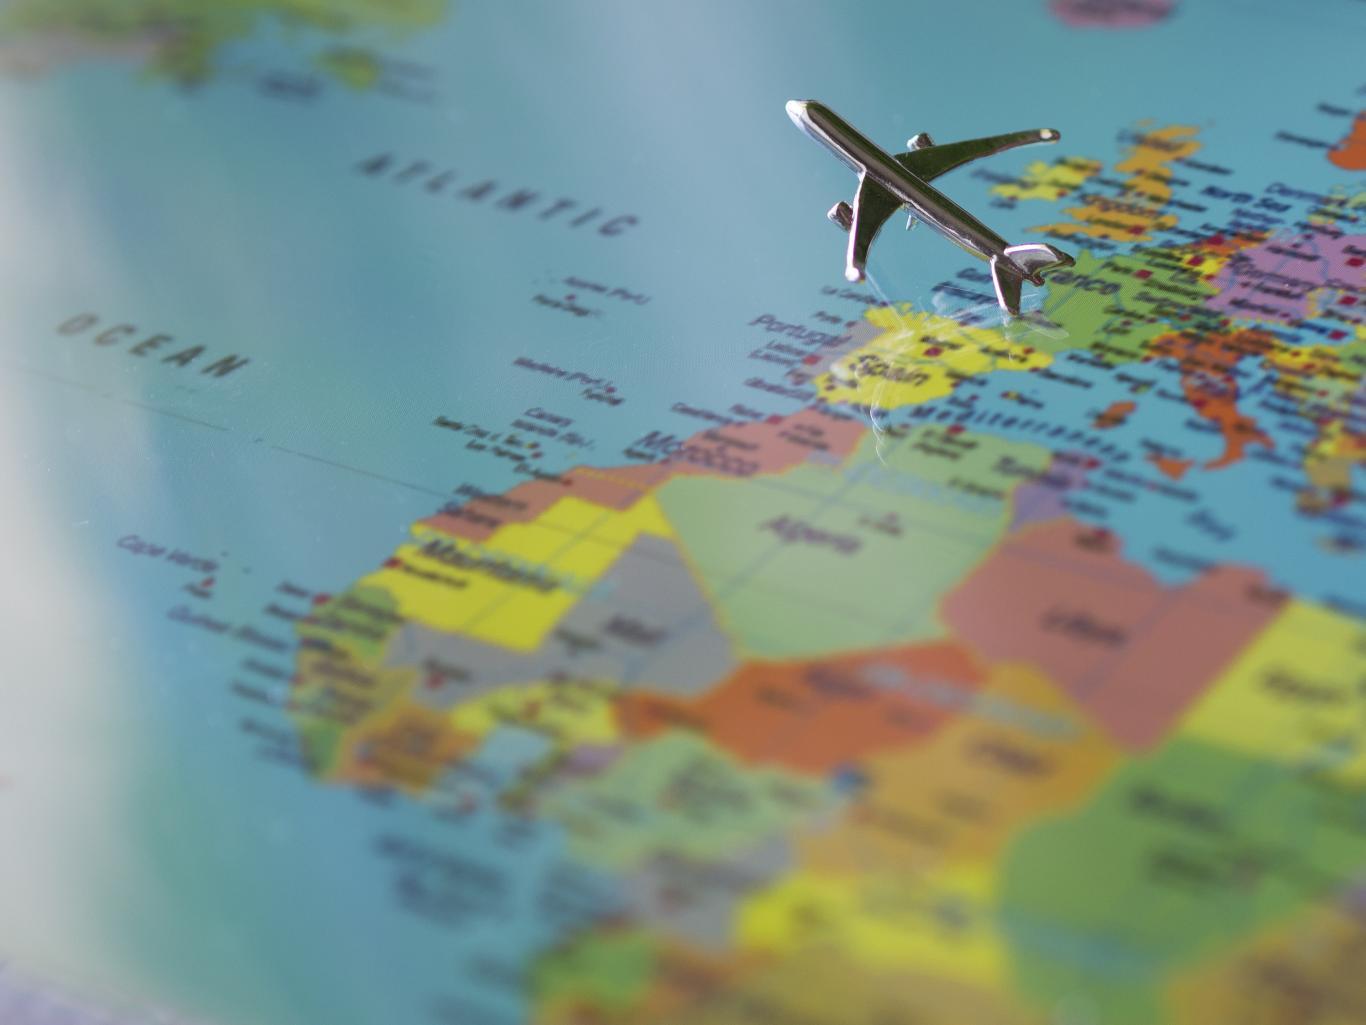 Avión despegando de un mapa de Europa